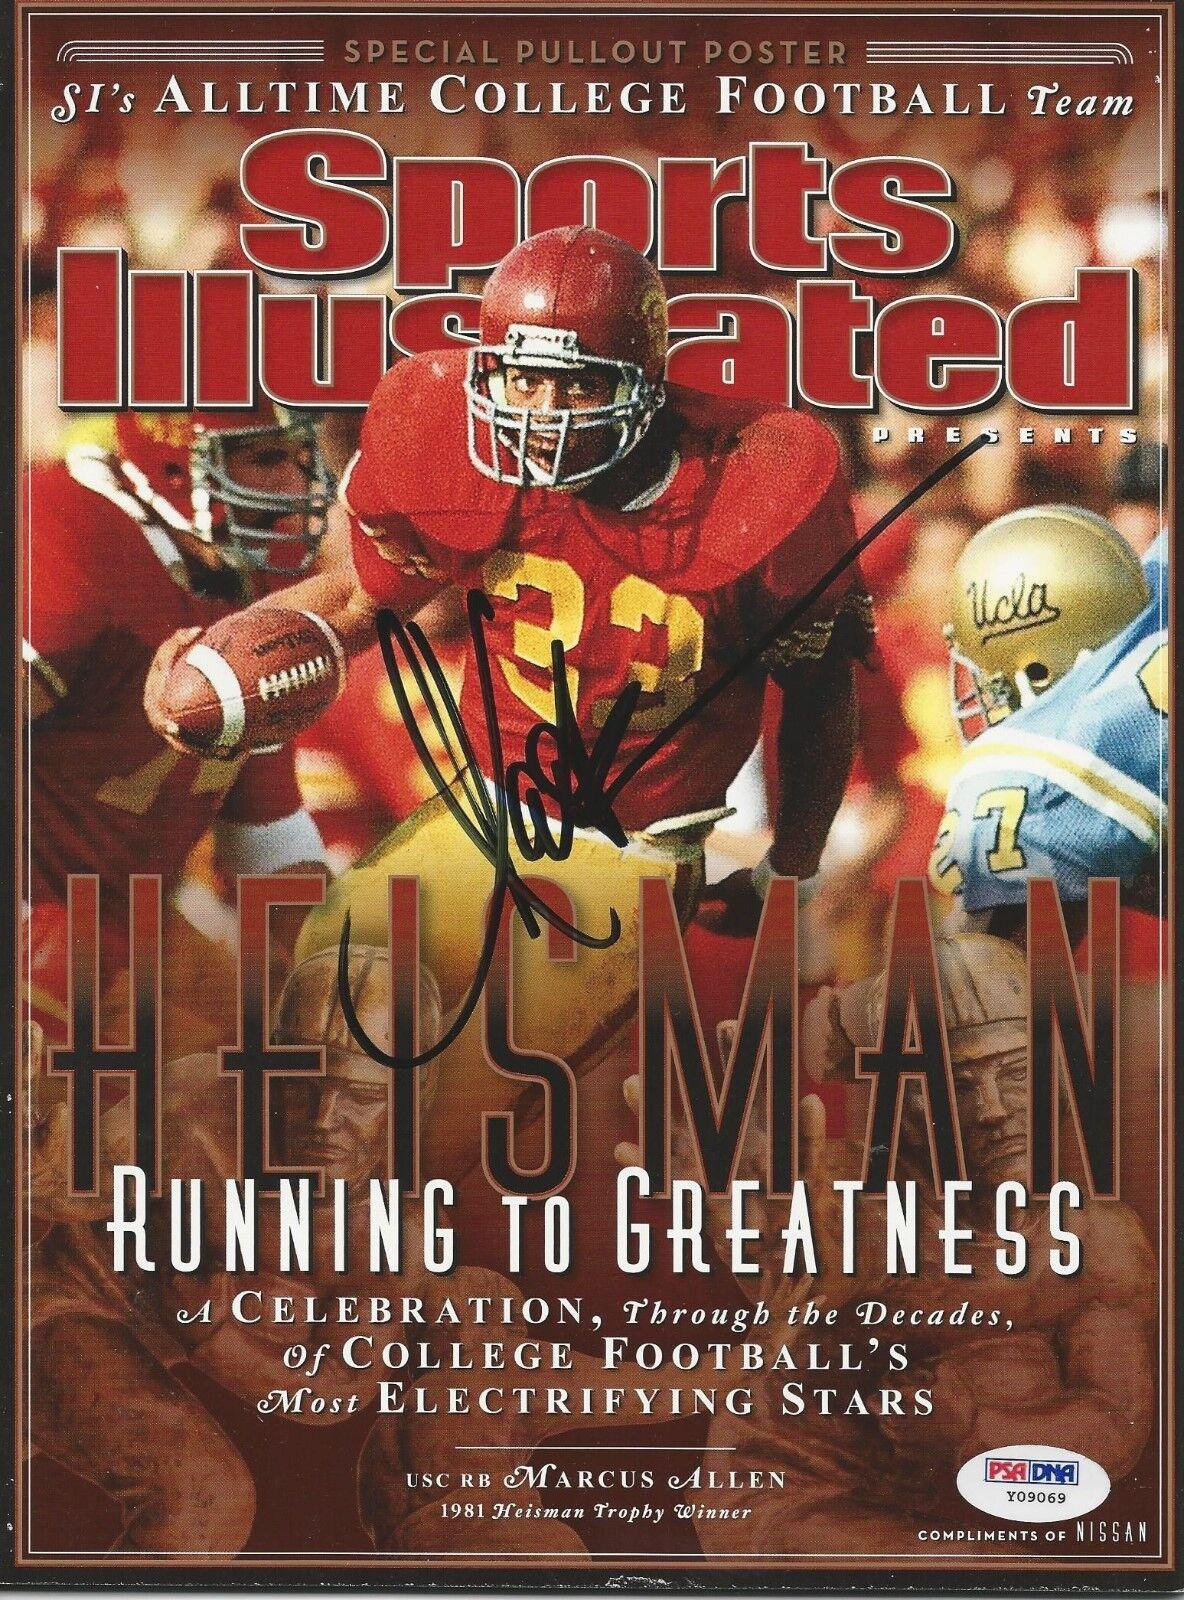 Marcus Allen Signed Heisman Sports Illustrated Magazine PSA/DNA Cert # Y09069